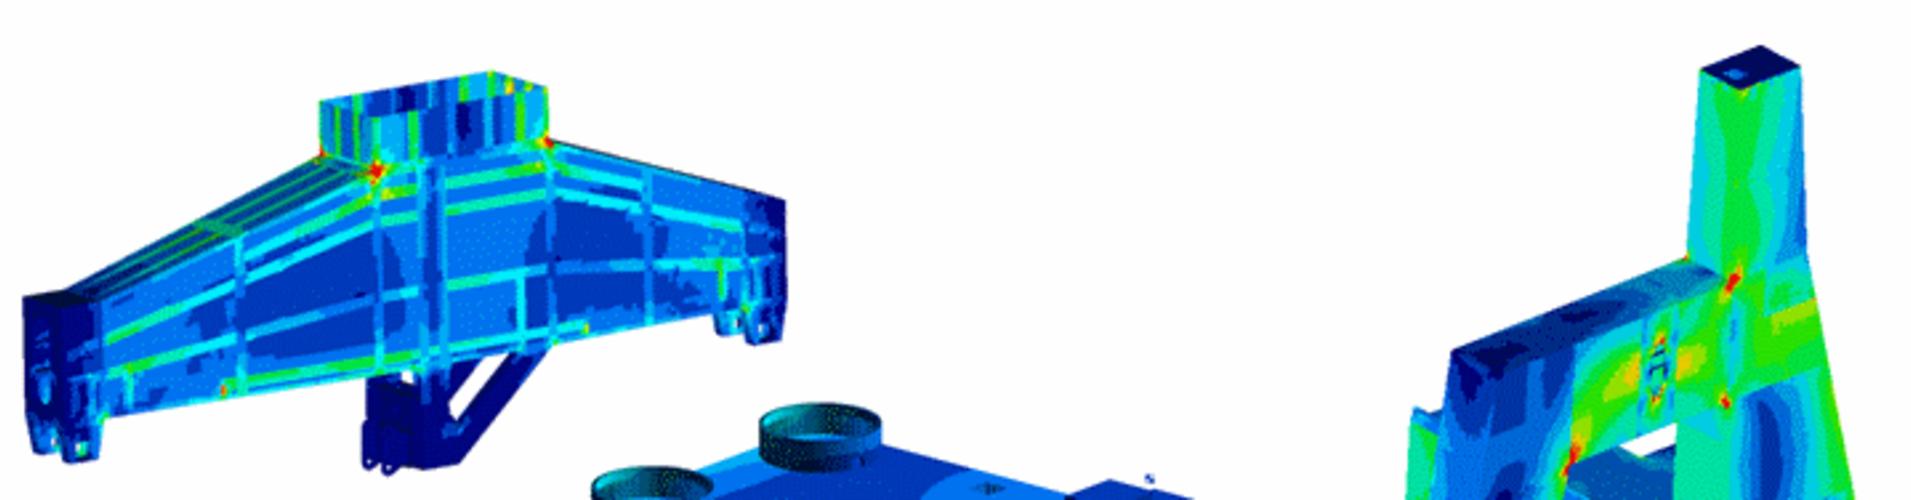 Key Features of SDC Verifier